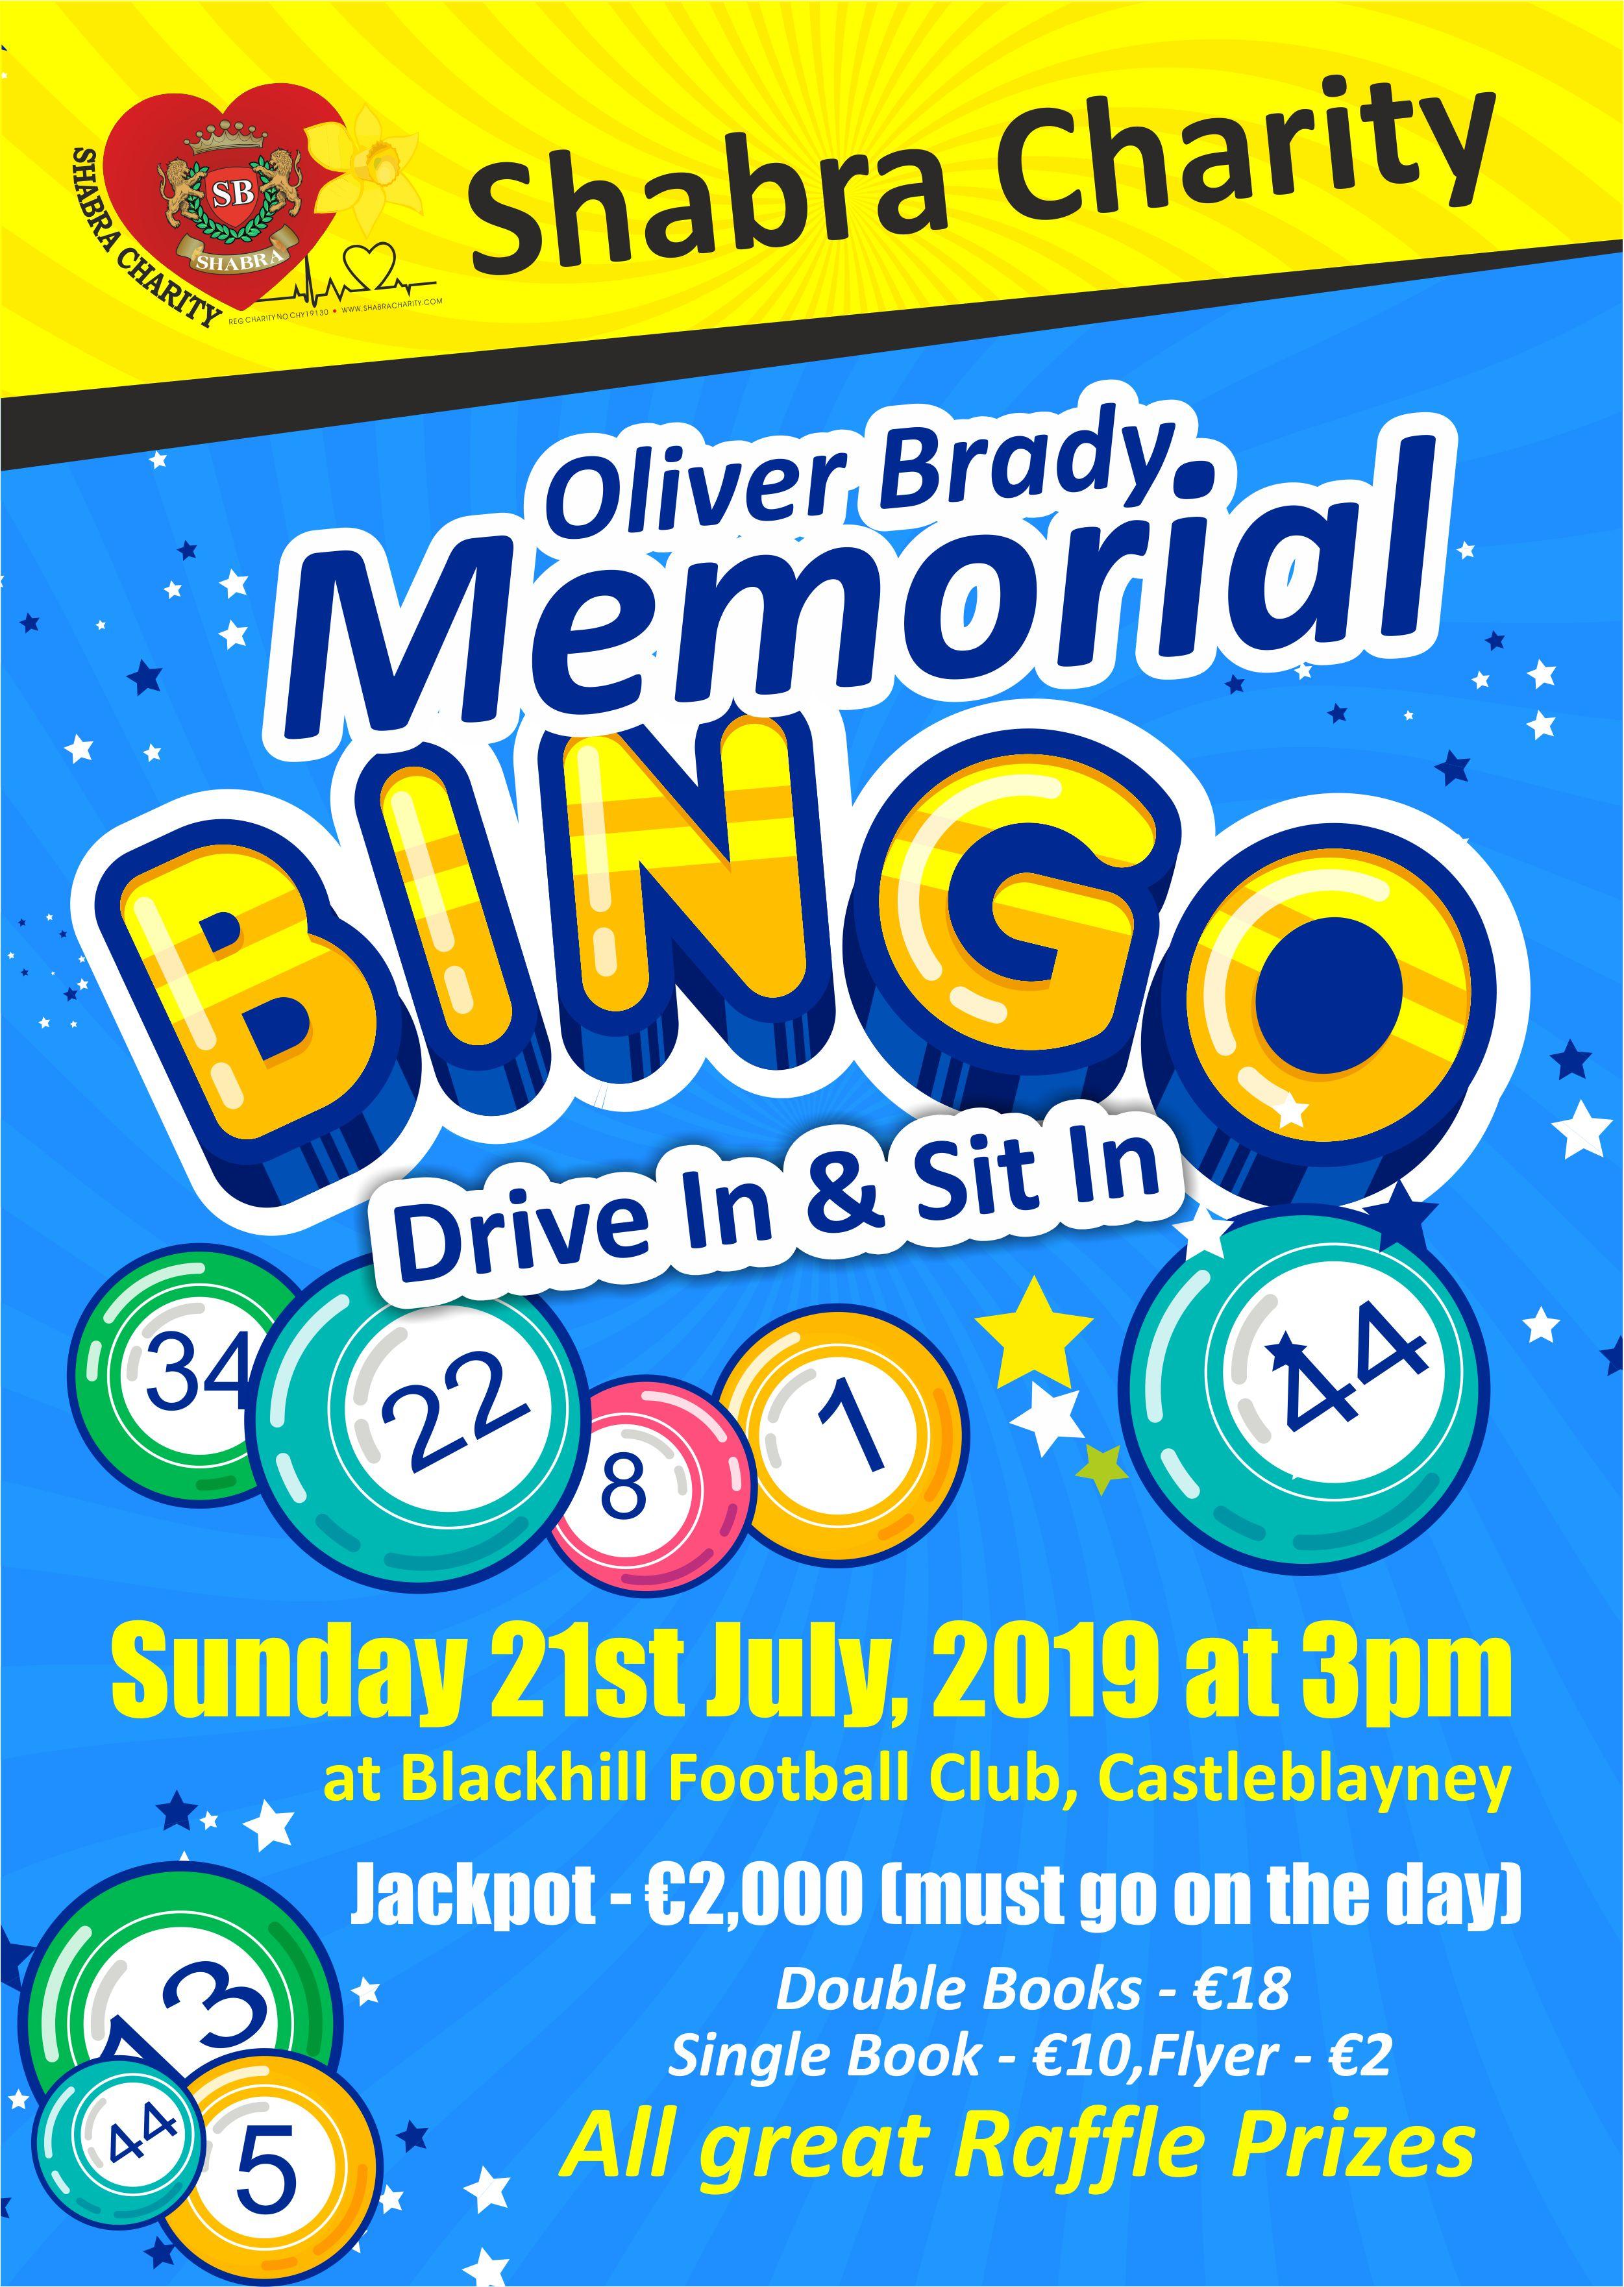 Shabra Charity Bingo